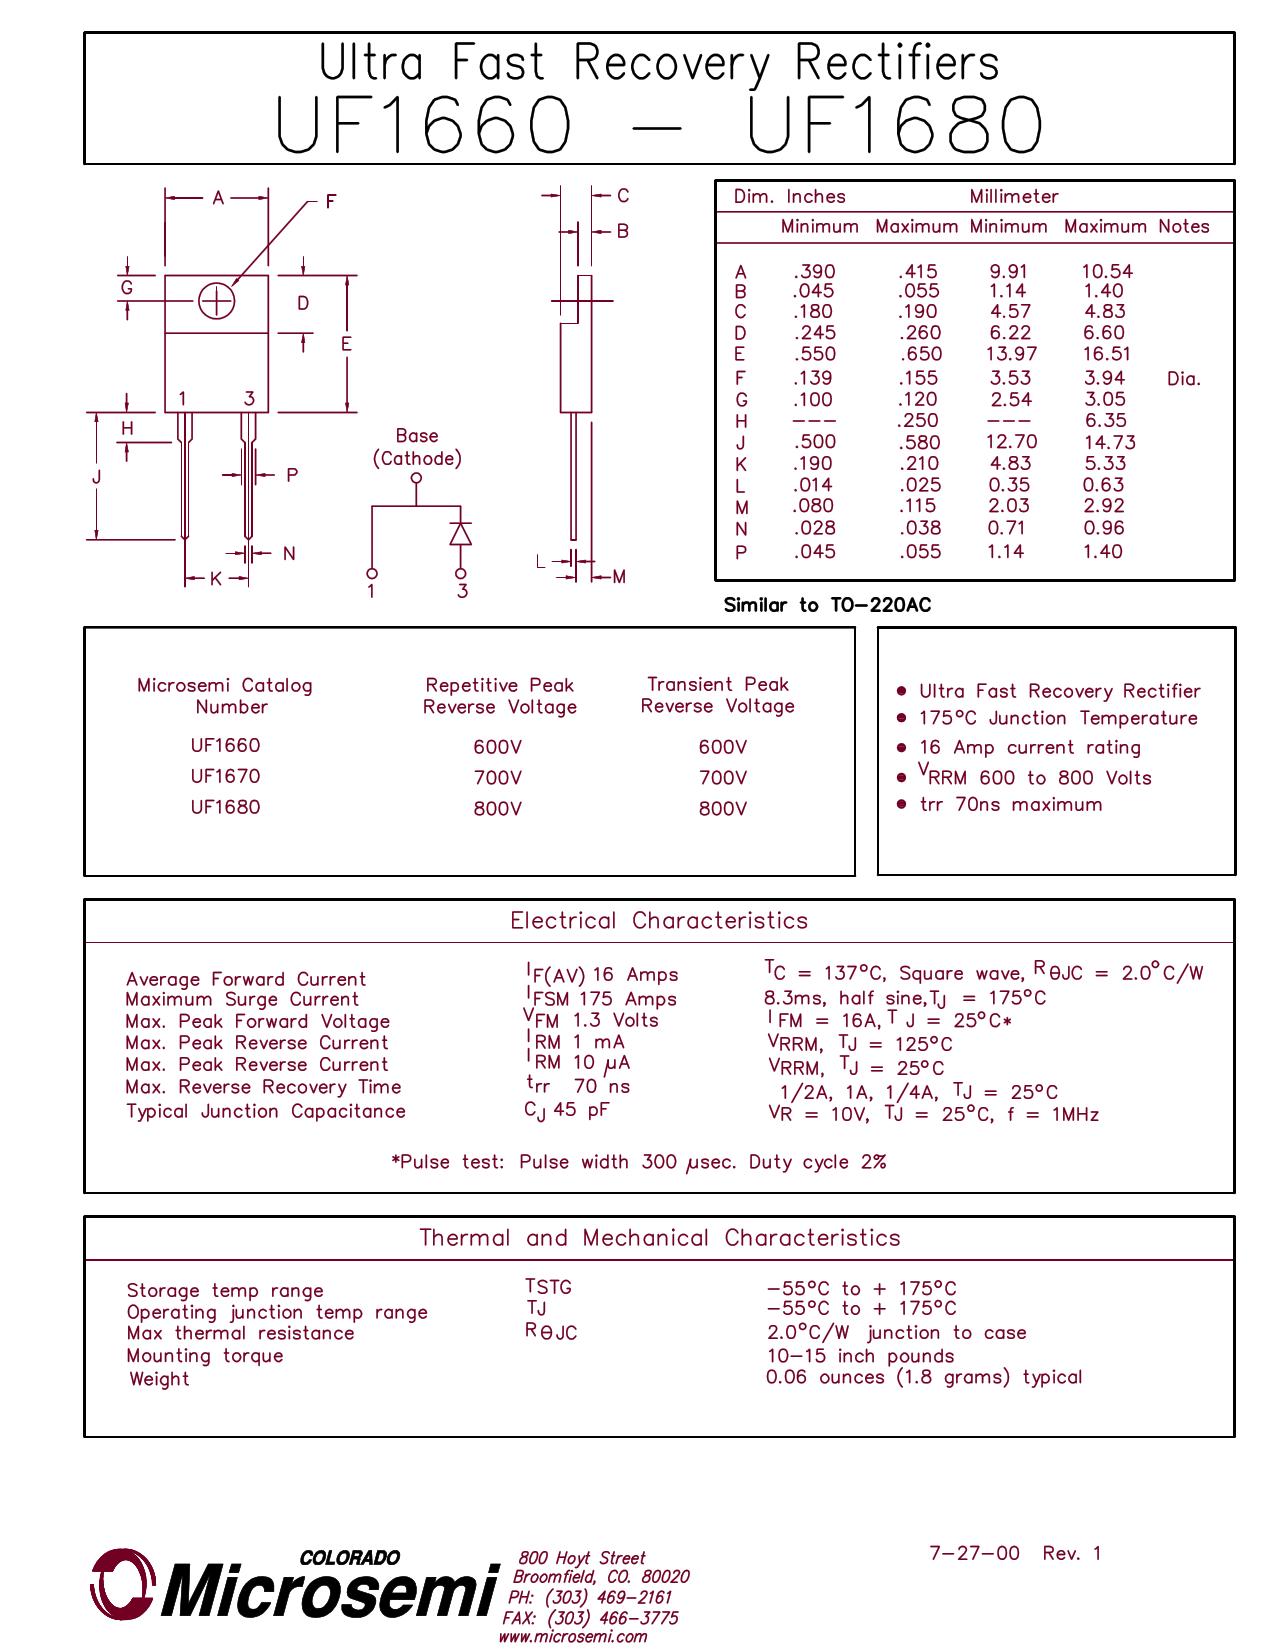 UF1670 데이터시트 및 UF1670 PDF